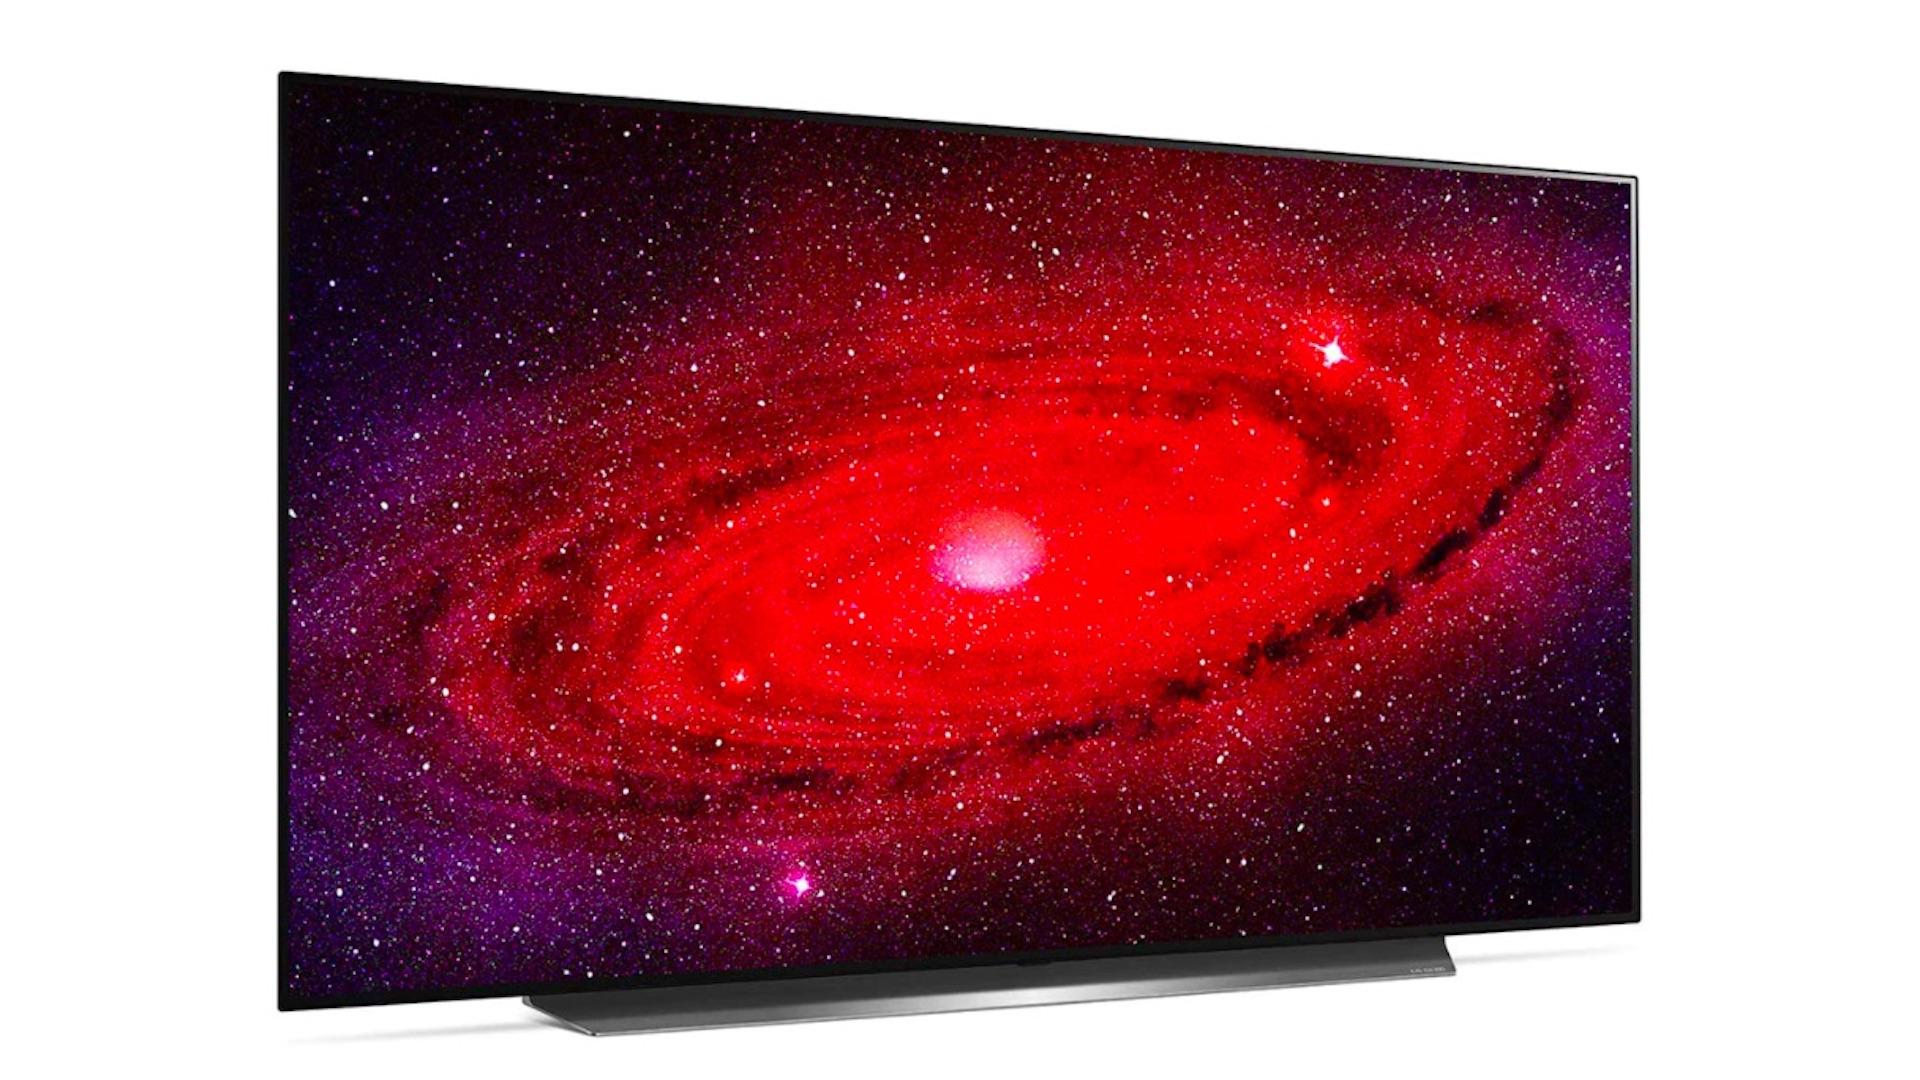 Pantalla LG OLED TV AI ThinQ 4K 65''. Foto de LG